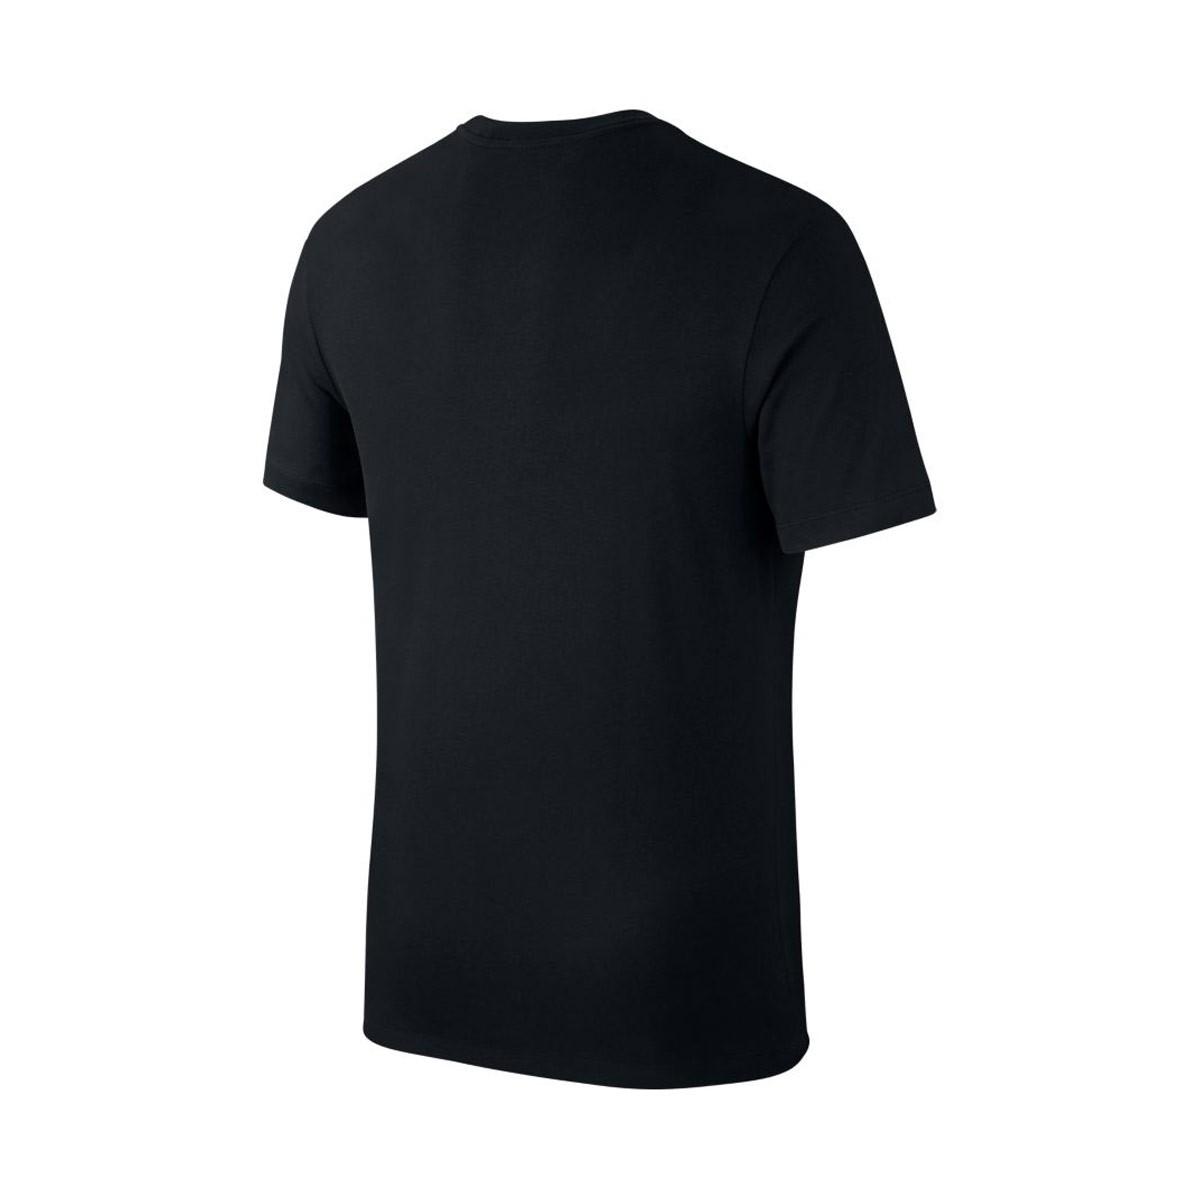 Camiseta Nike F C  Seasonal Block Black